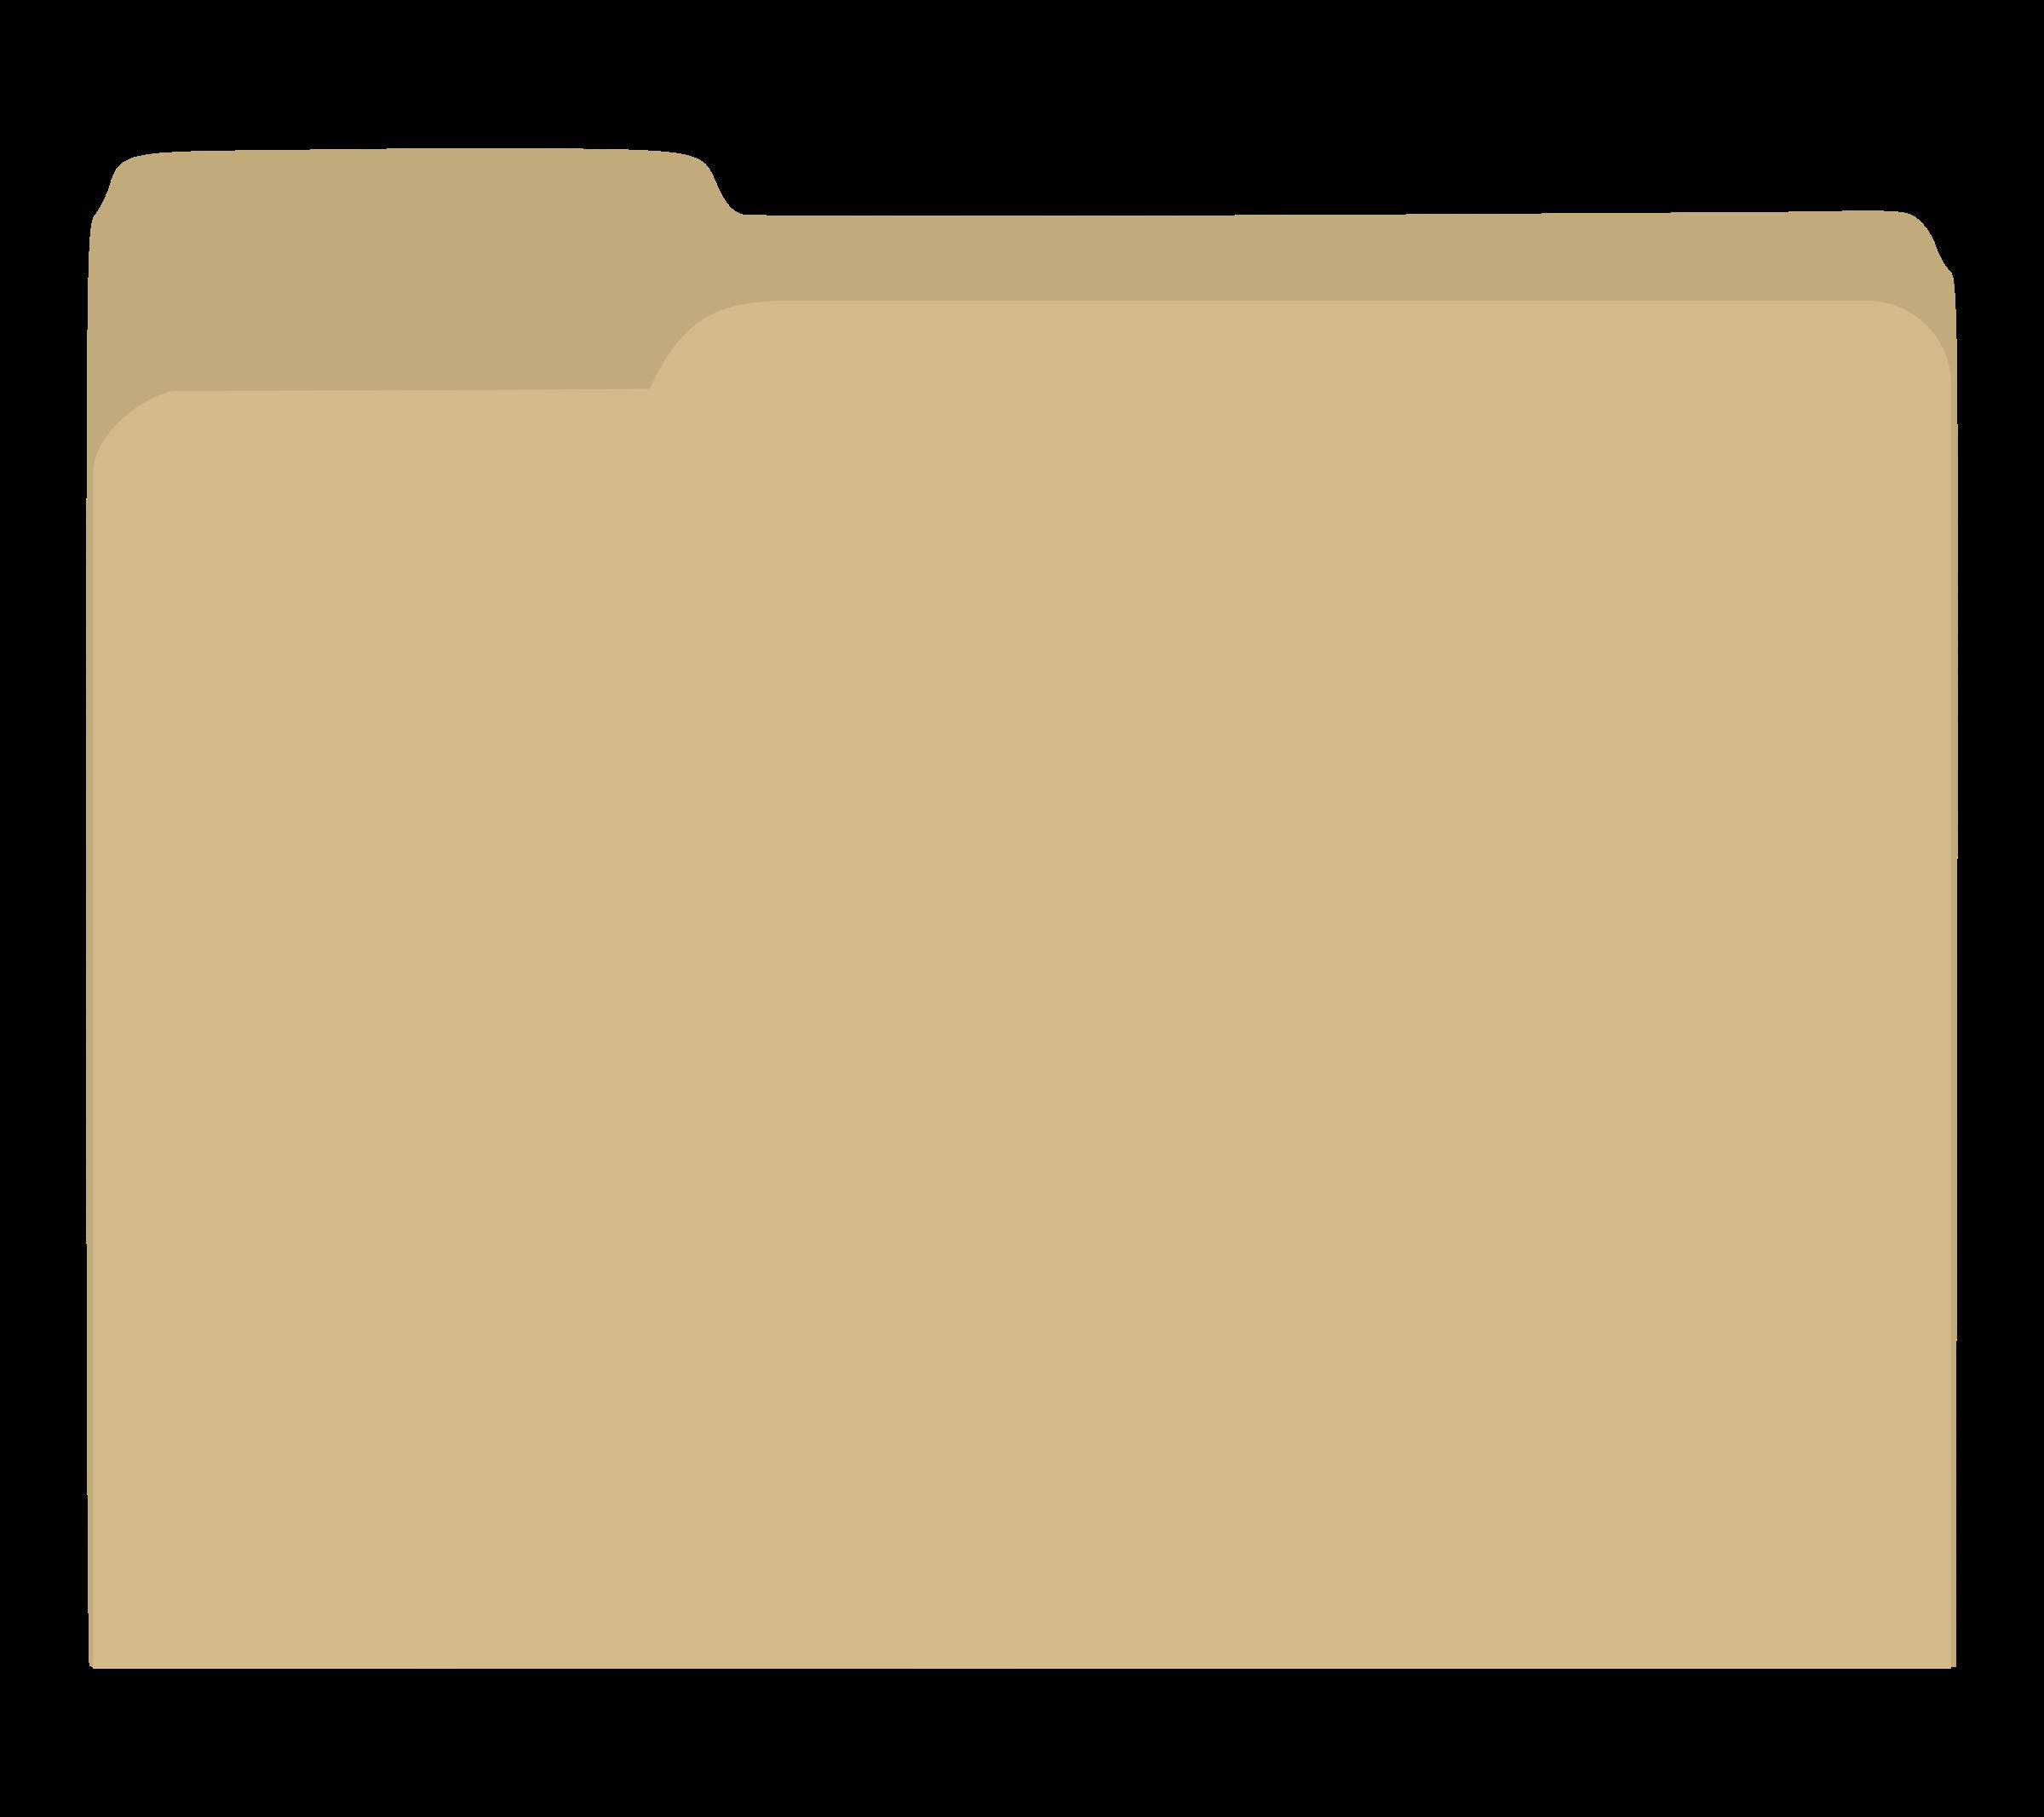 Folder clipart folder manila. Manilla